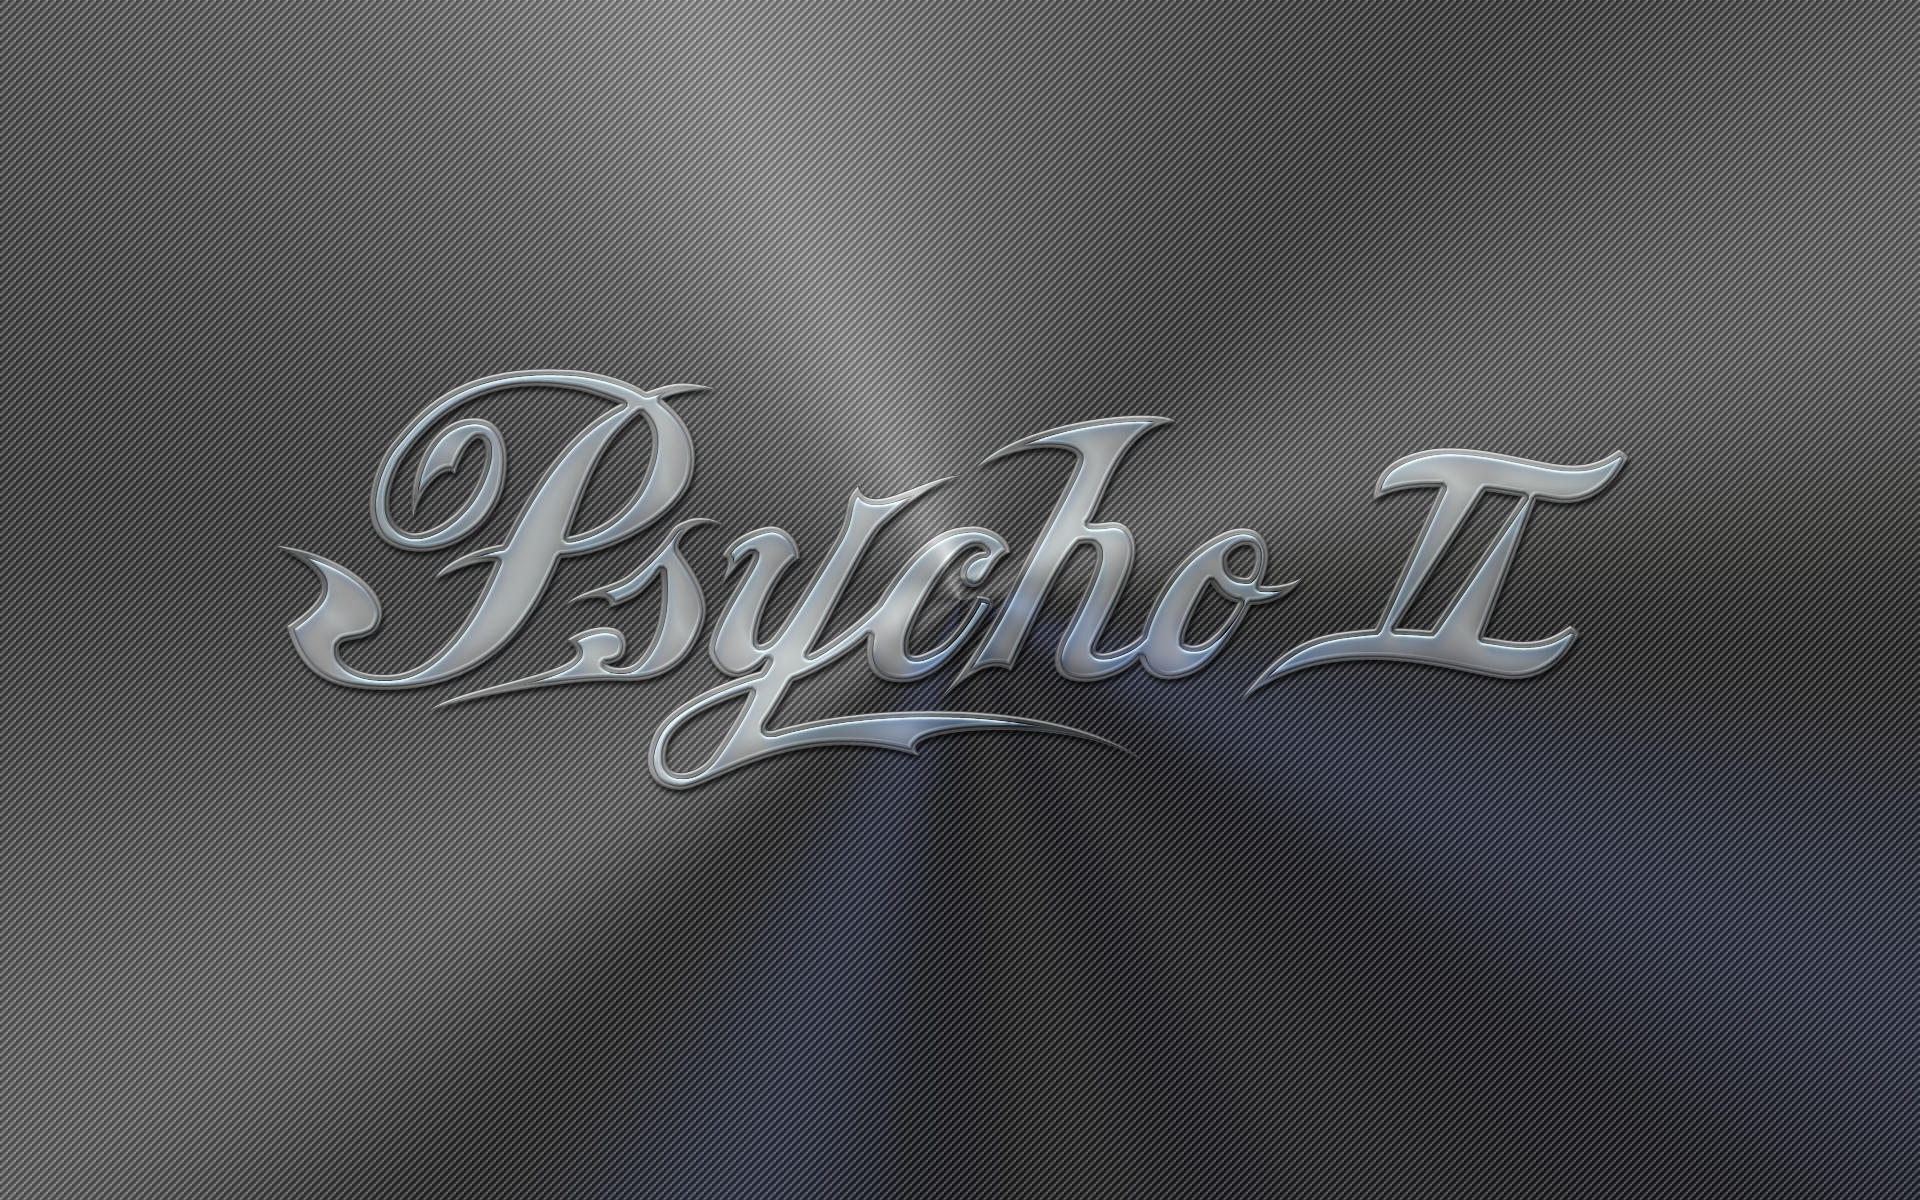 Psycho II Wallpack by SKoriginals